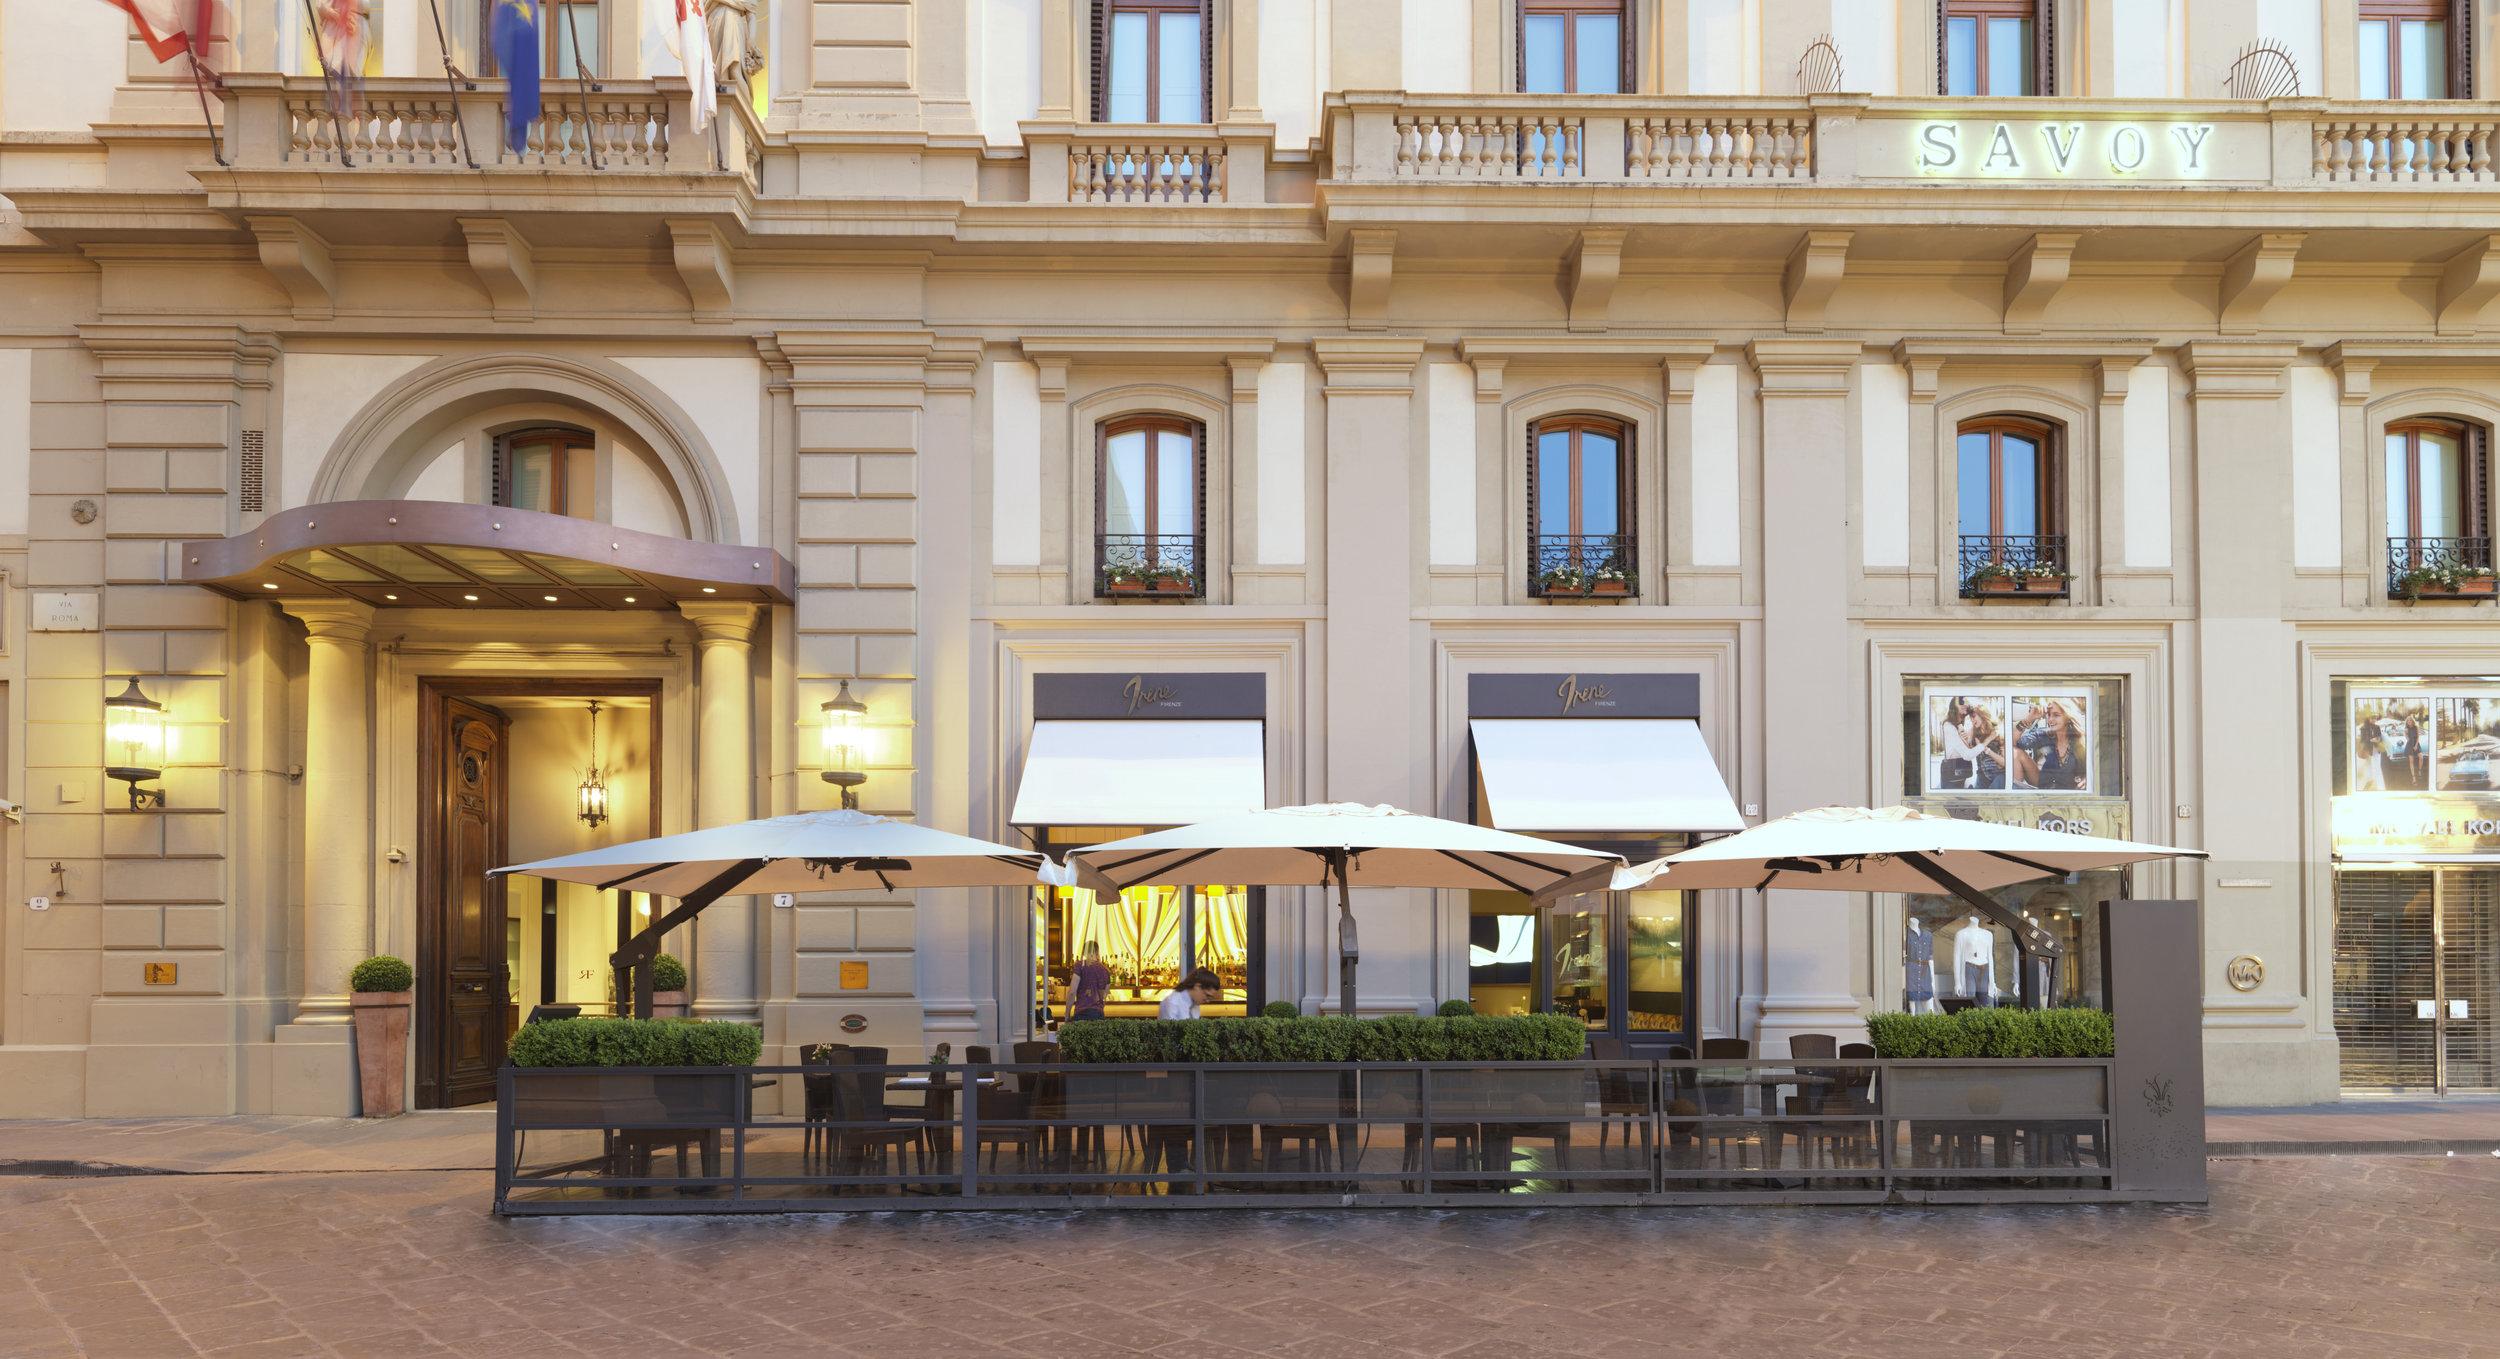 SA - Hotel Savoy - 2.jpg